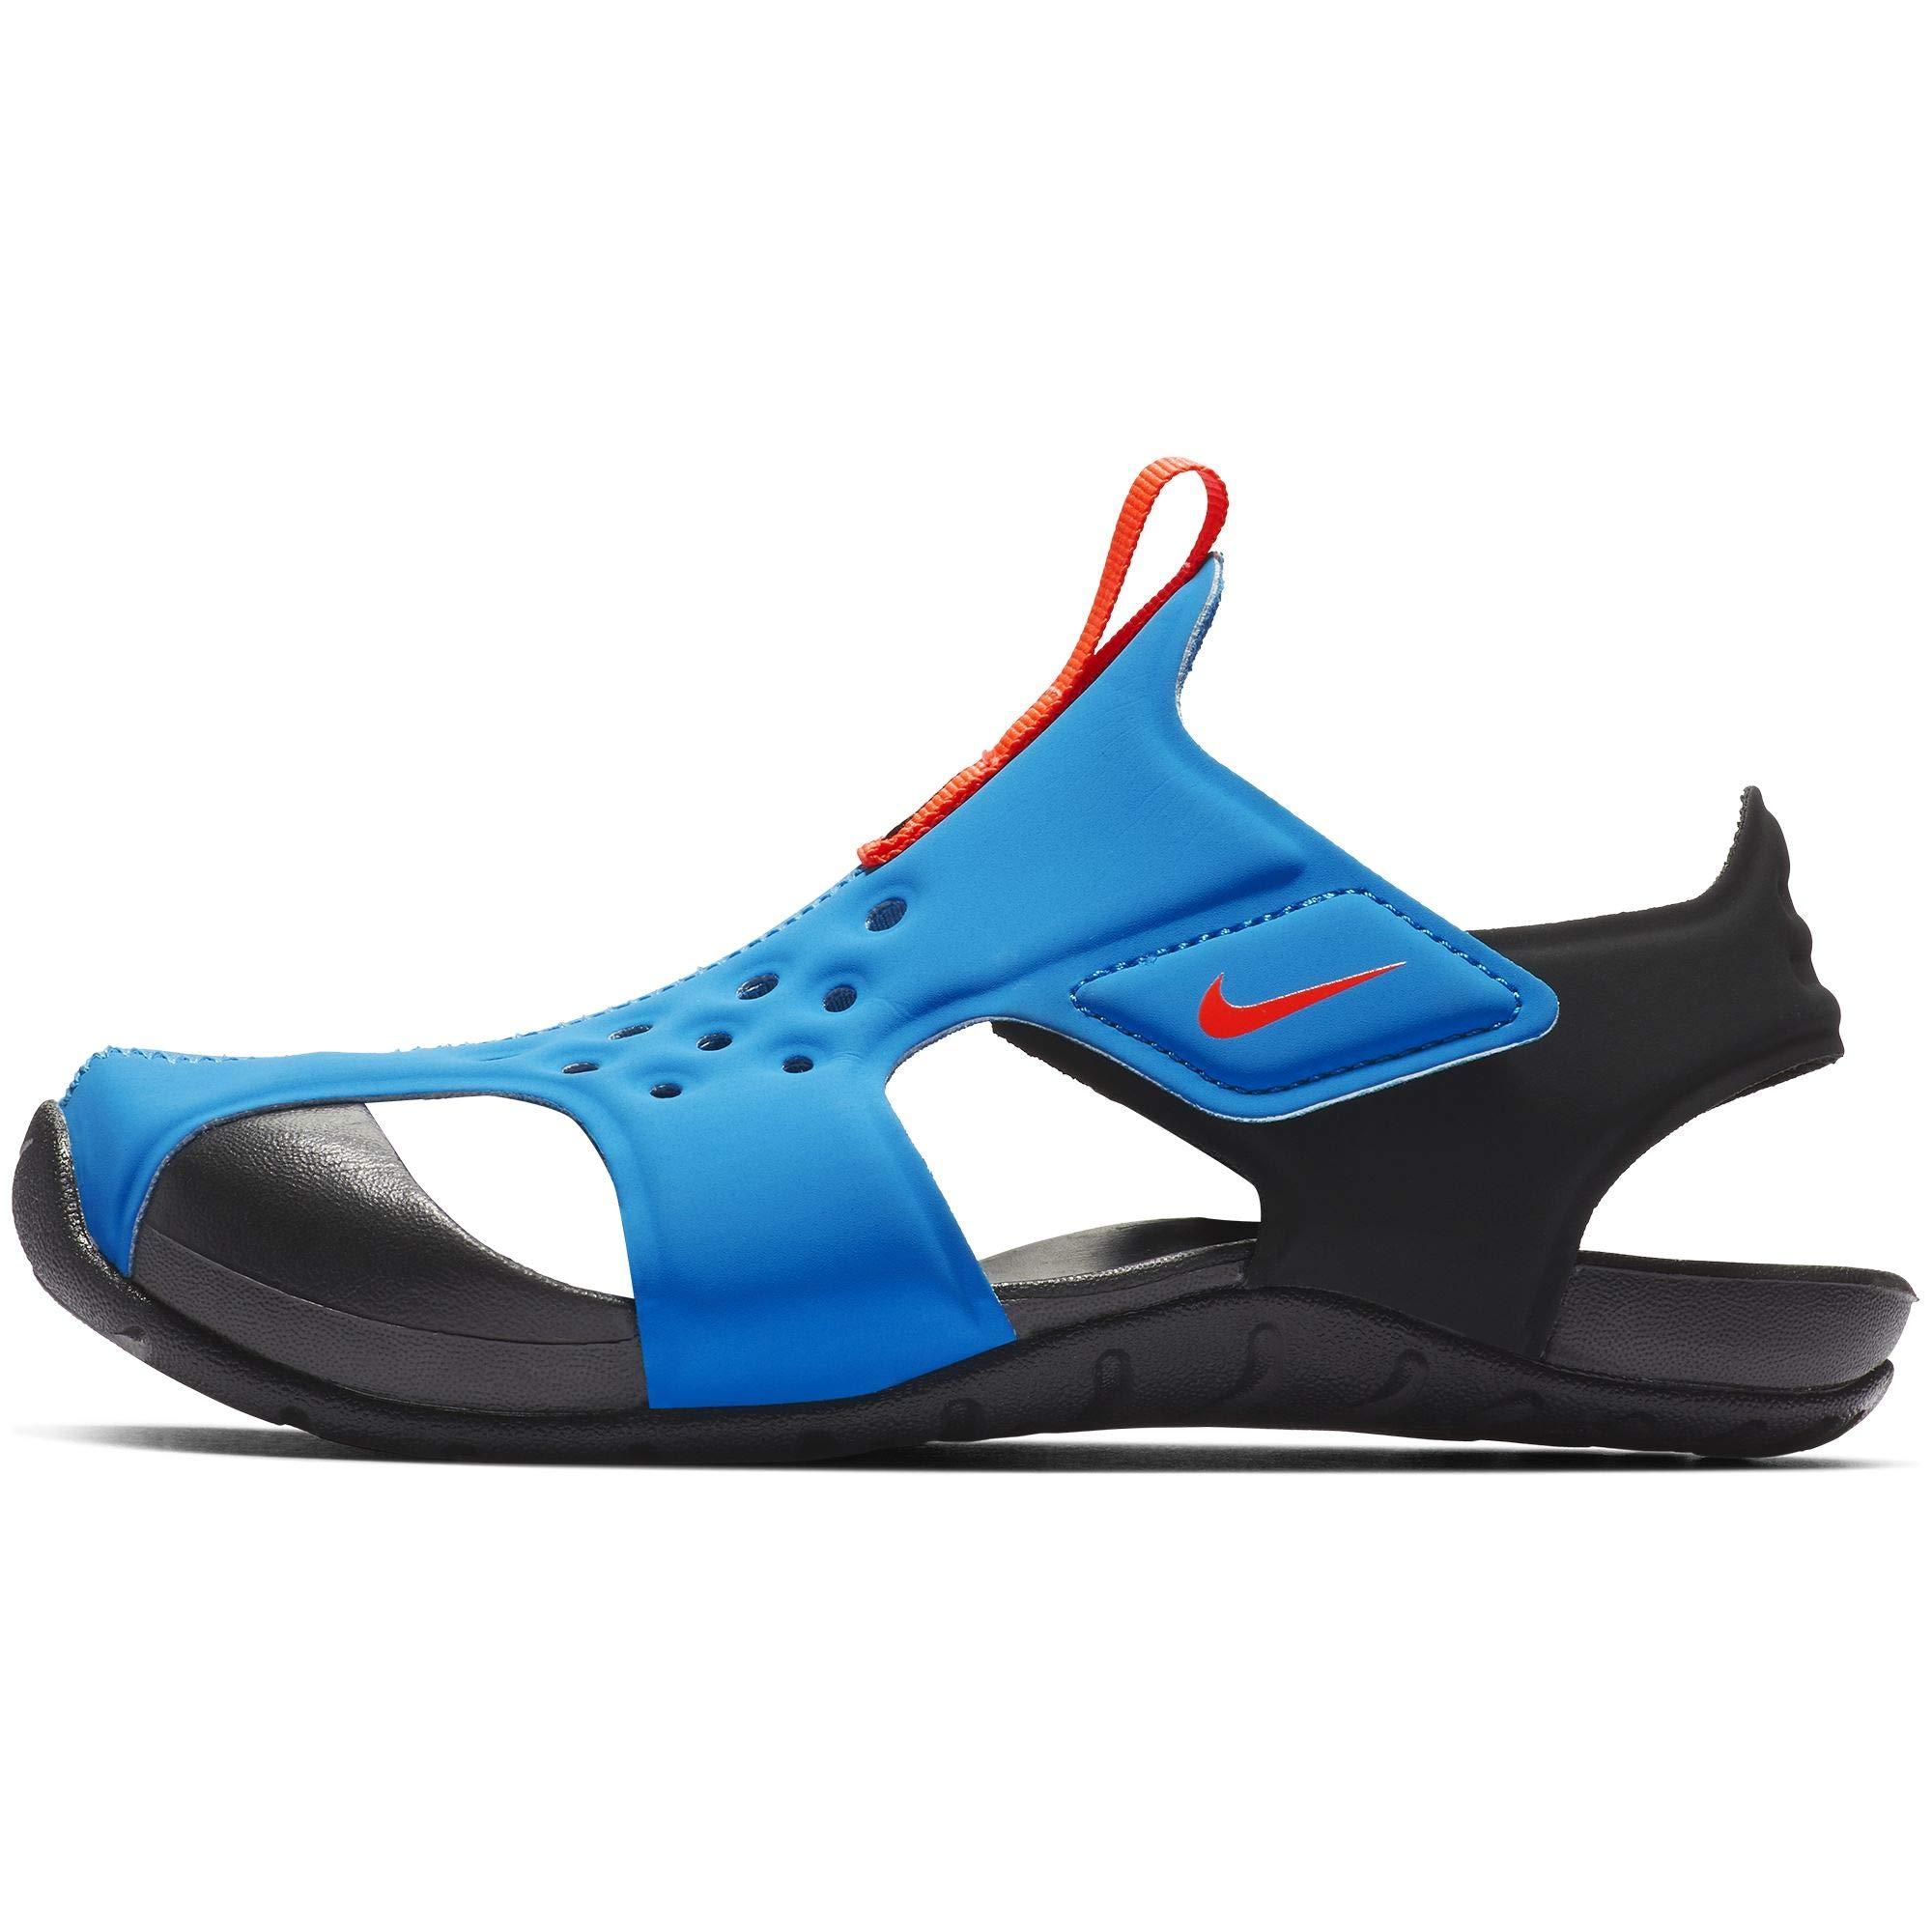 Nike Boys' Sunray Protect 2 (PS) Preschool Sandal Photo Blue/Bright Crimson-Black, Size 12 M US Little Kid